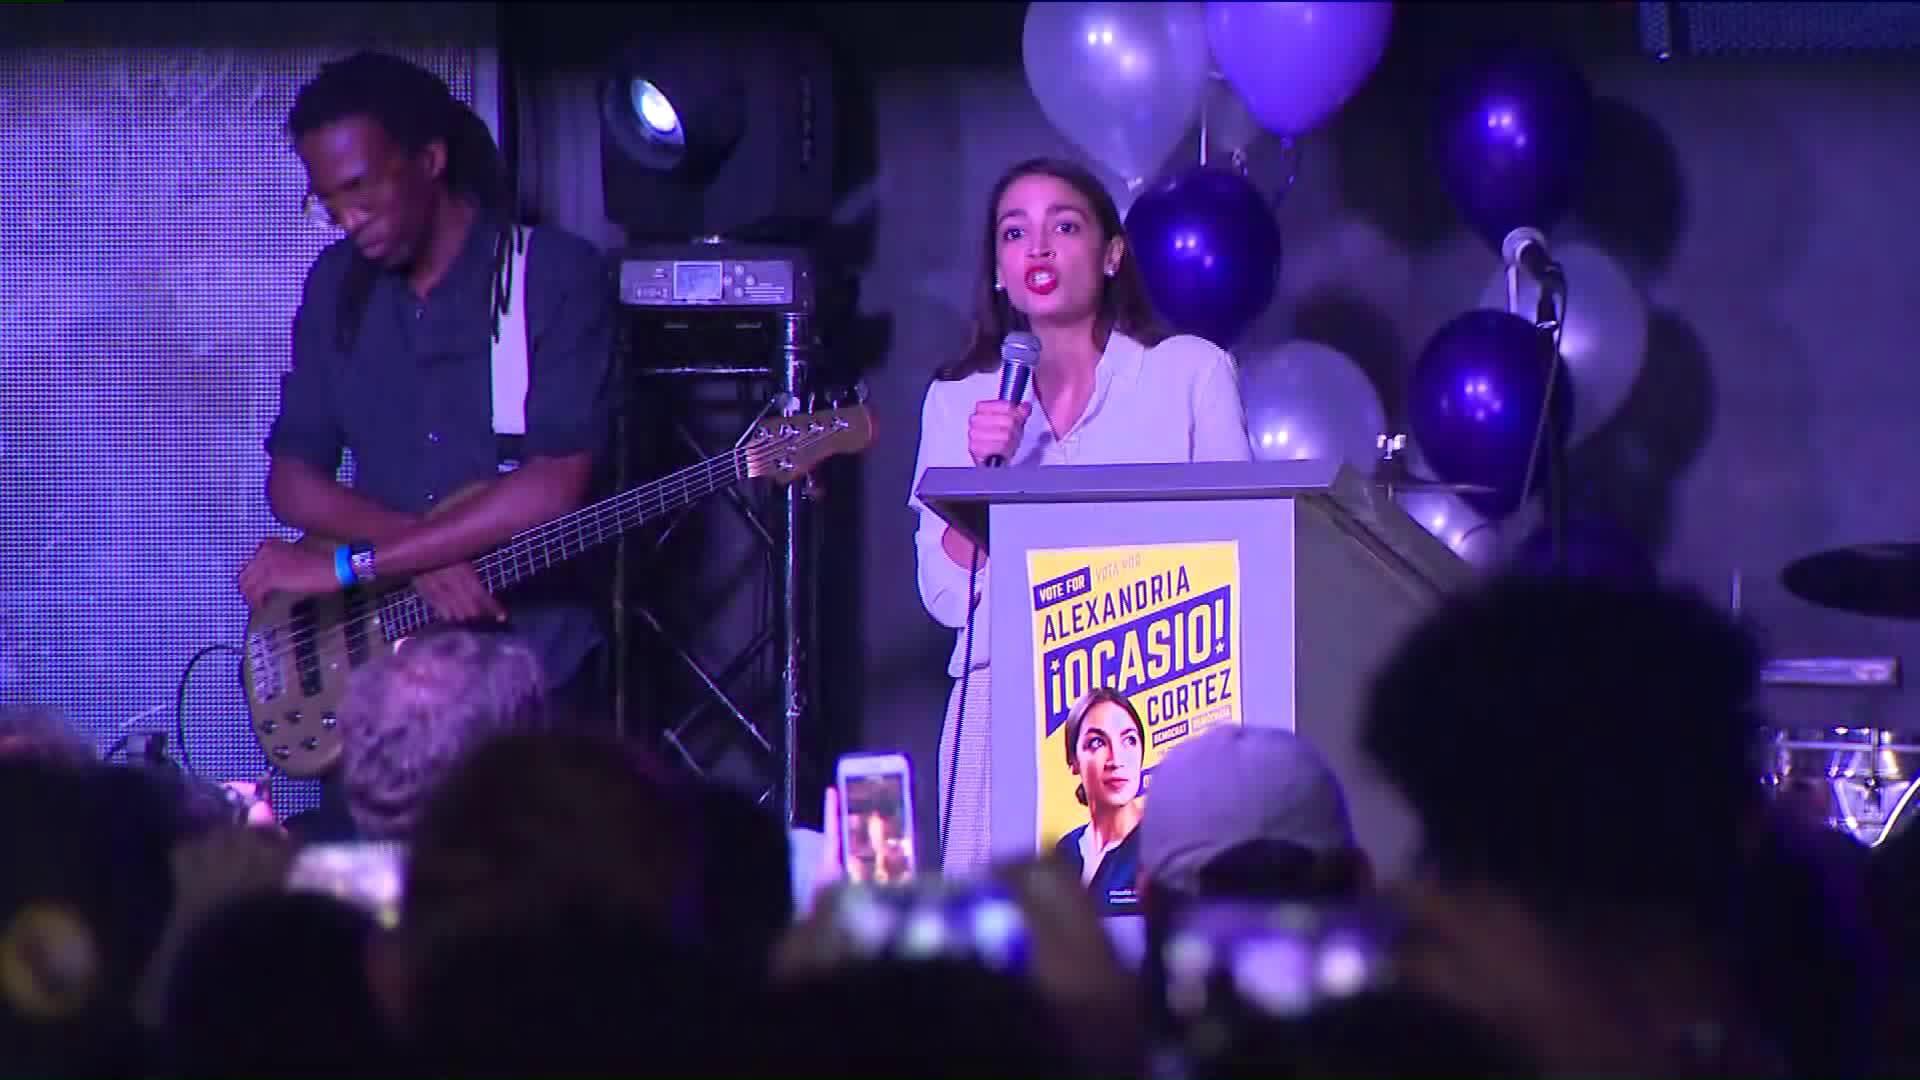 Congresswoman-Elect Alexandria Ocasio-Cortez Can`t Afford Apartment in DC